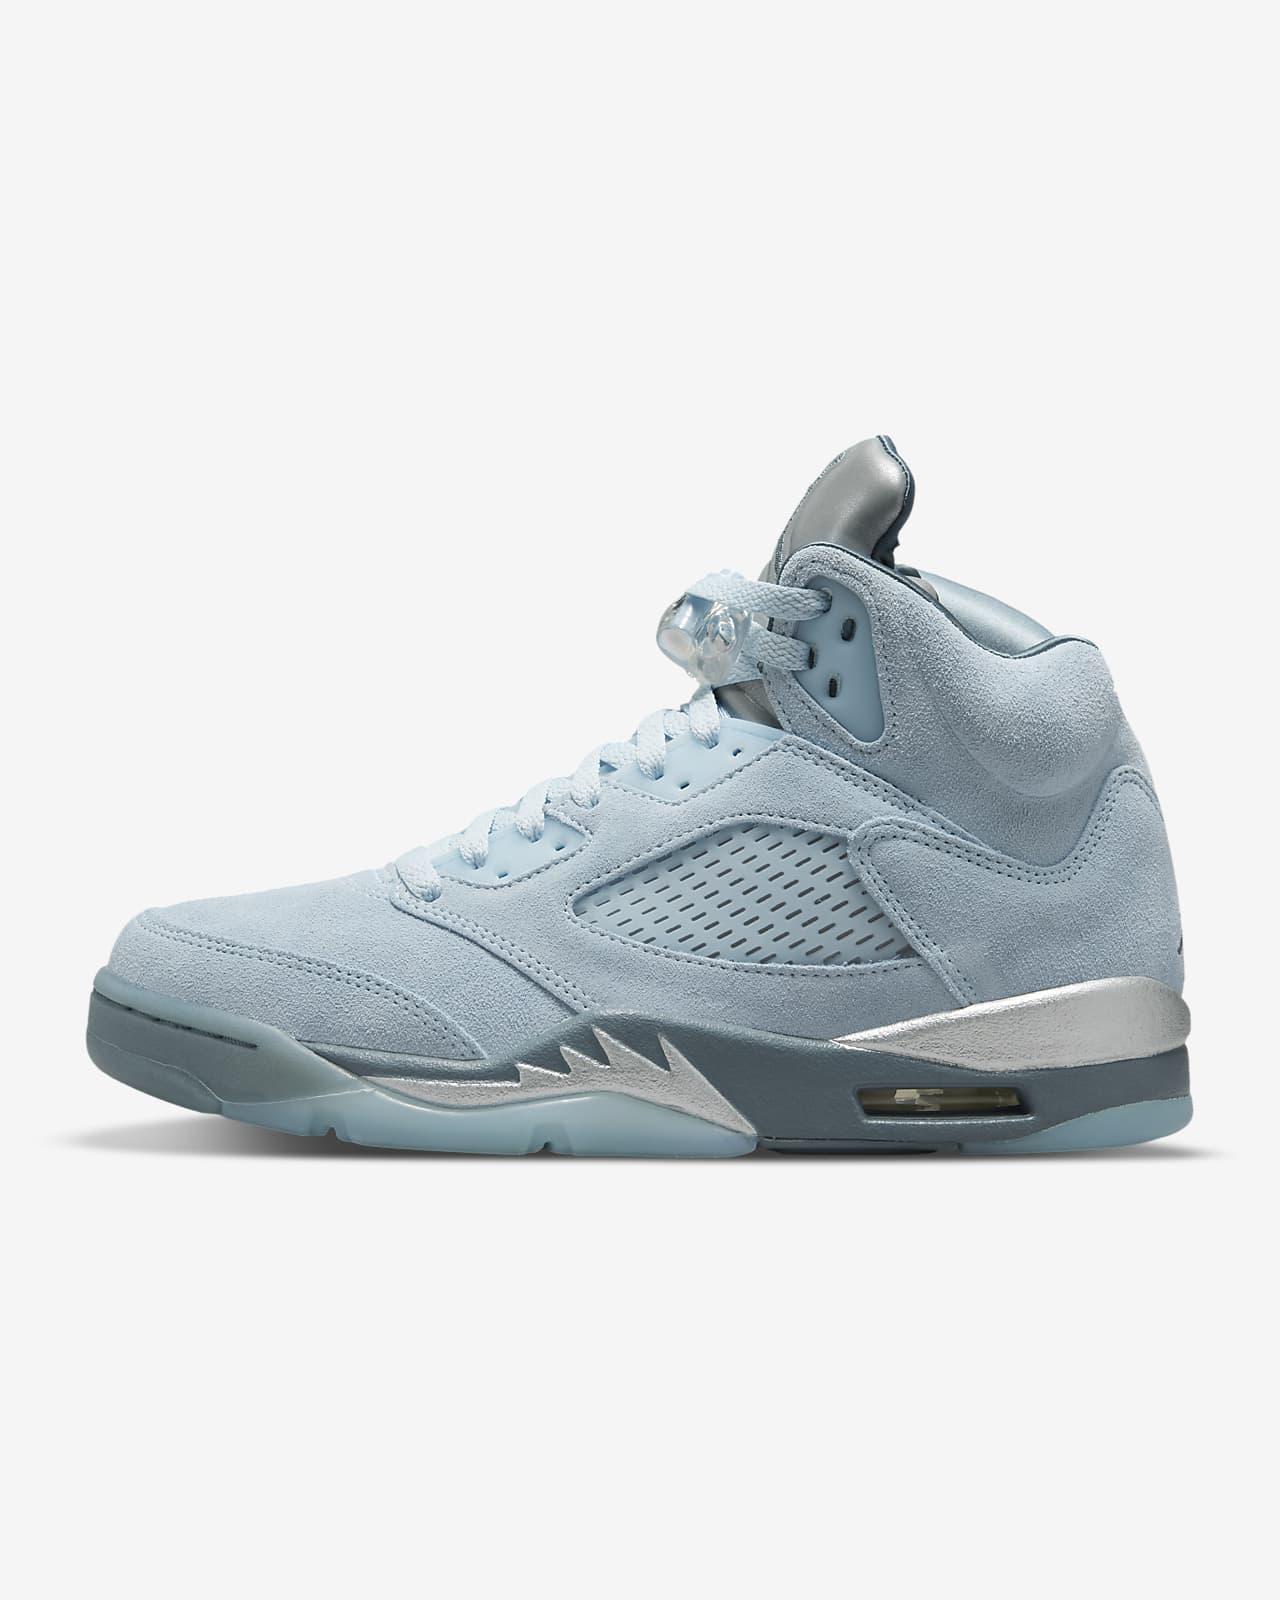 Air Jordan 5 Retro Women's Shoe